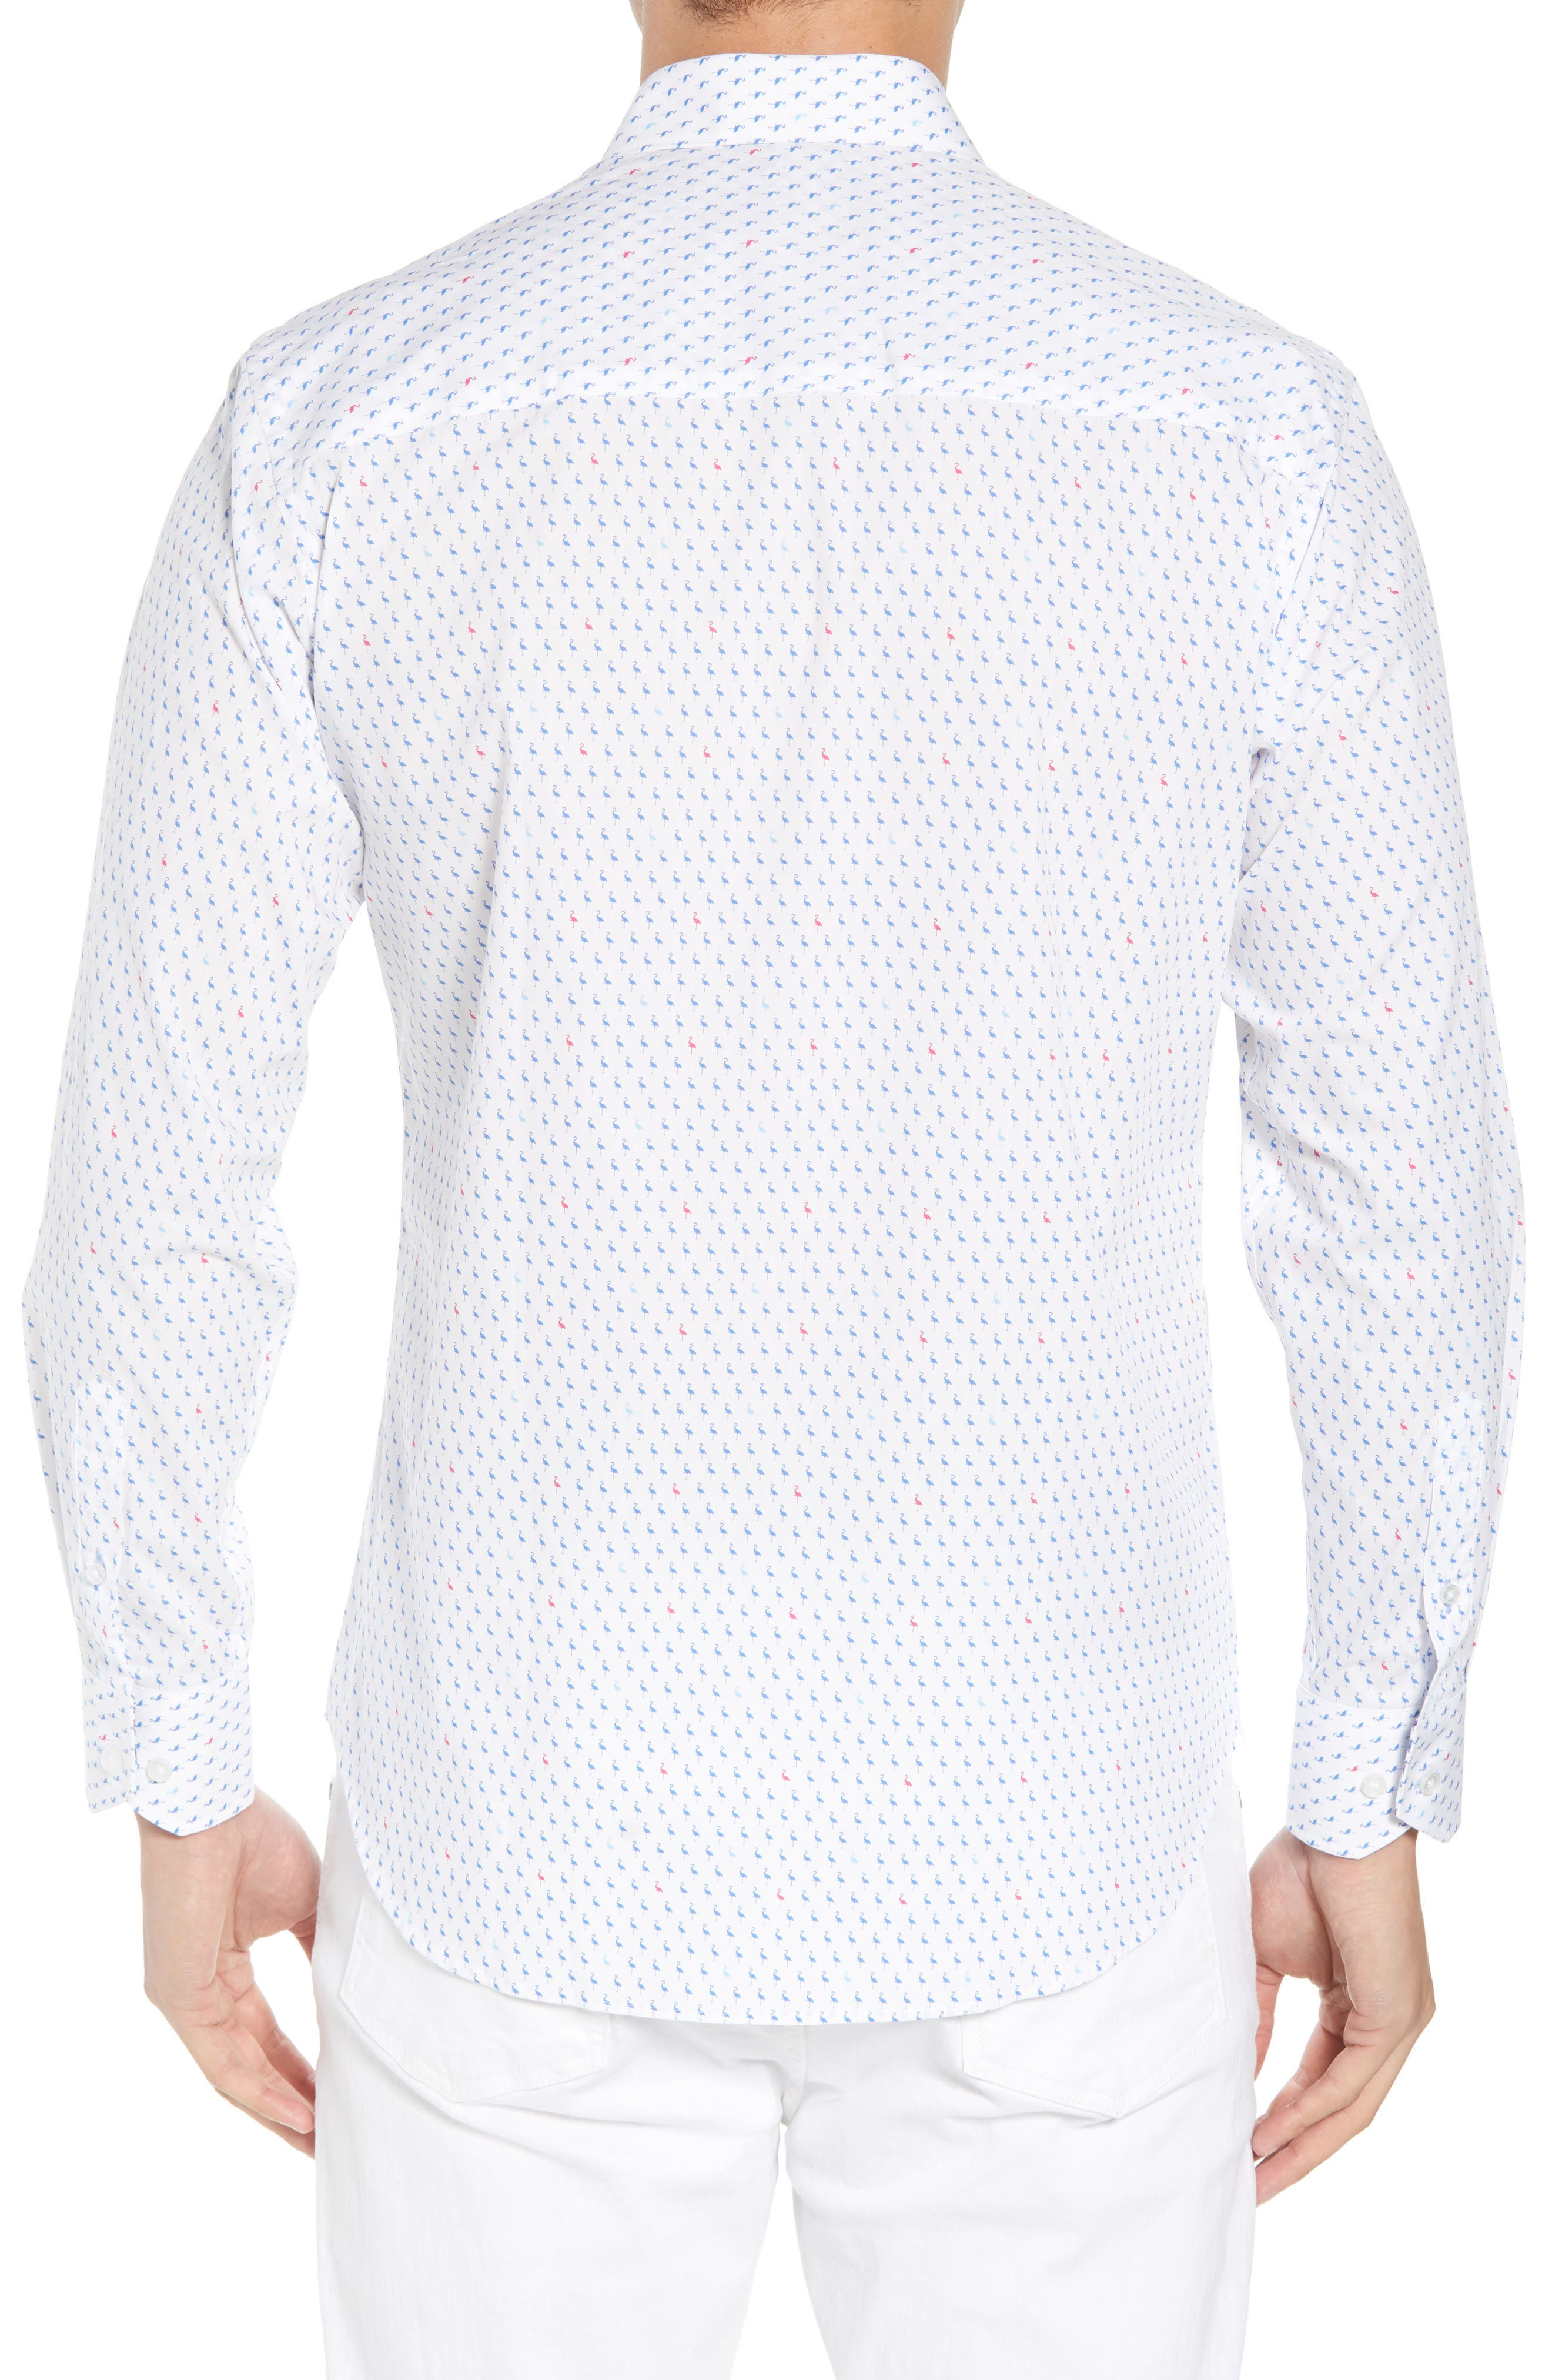 Auden Regular Fit Print Sport Shirt,                             Alternate thumbnail 3, color,                             Peri Blue